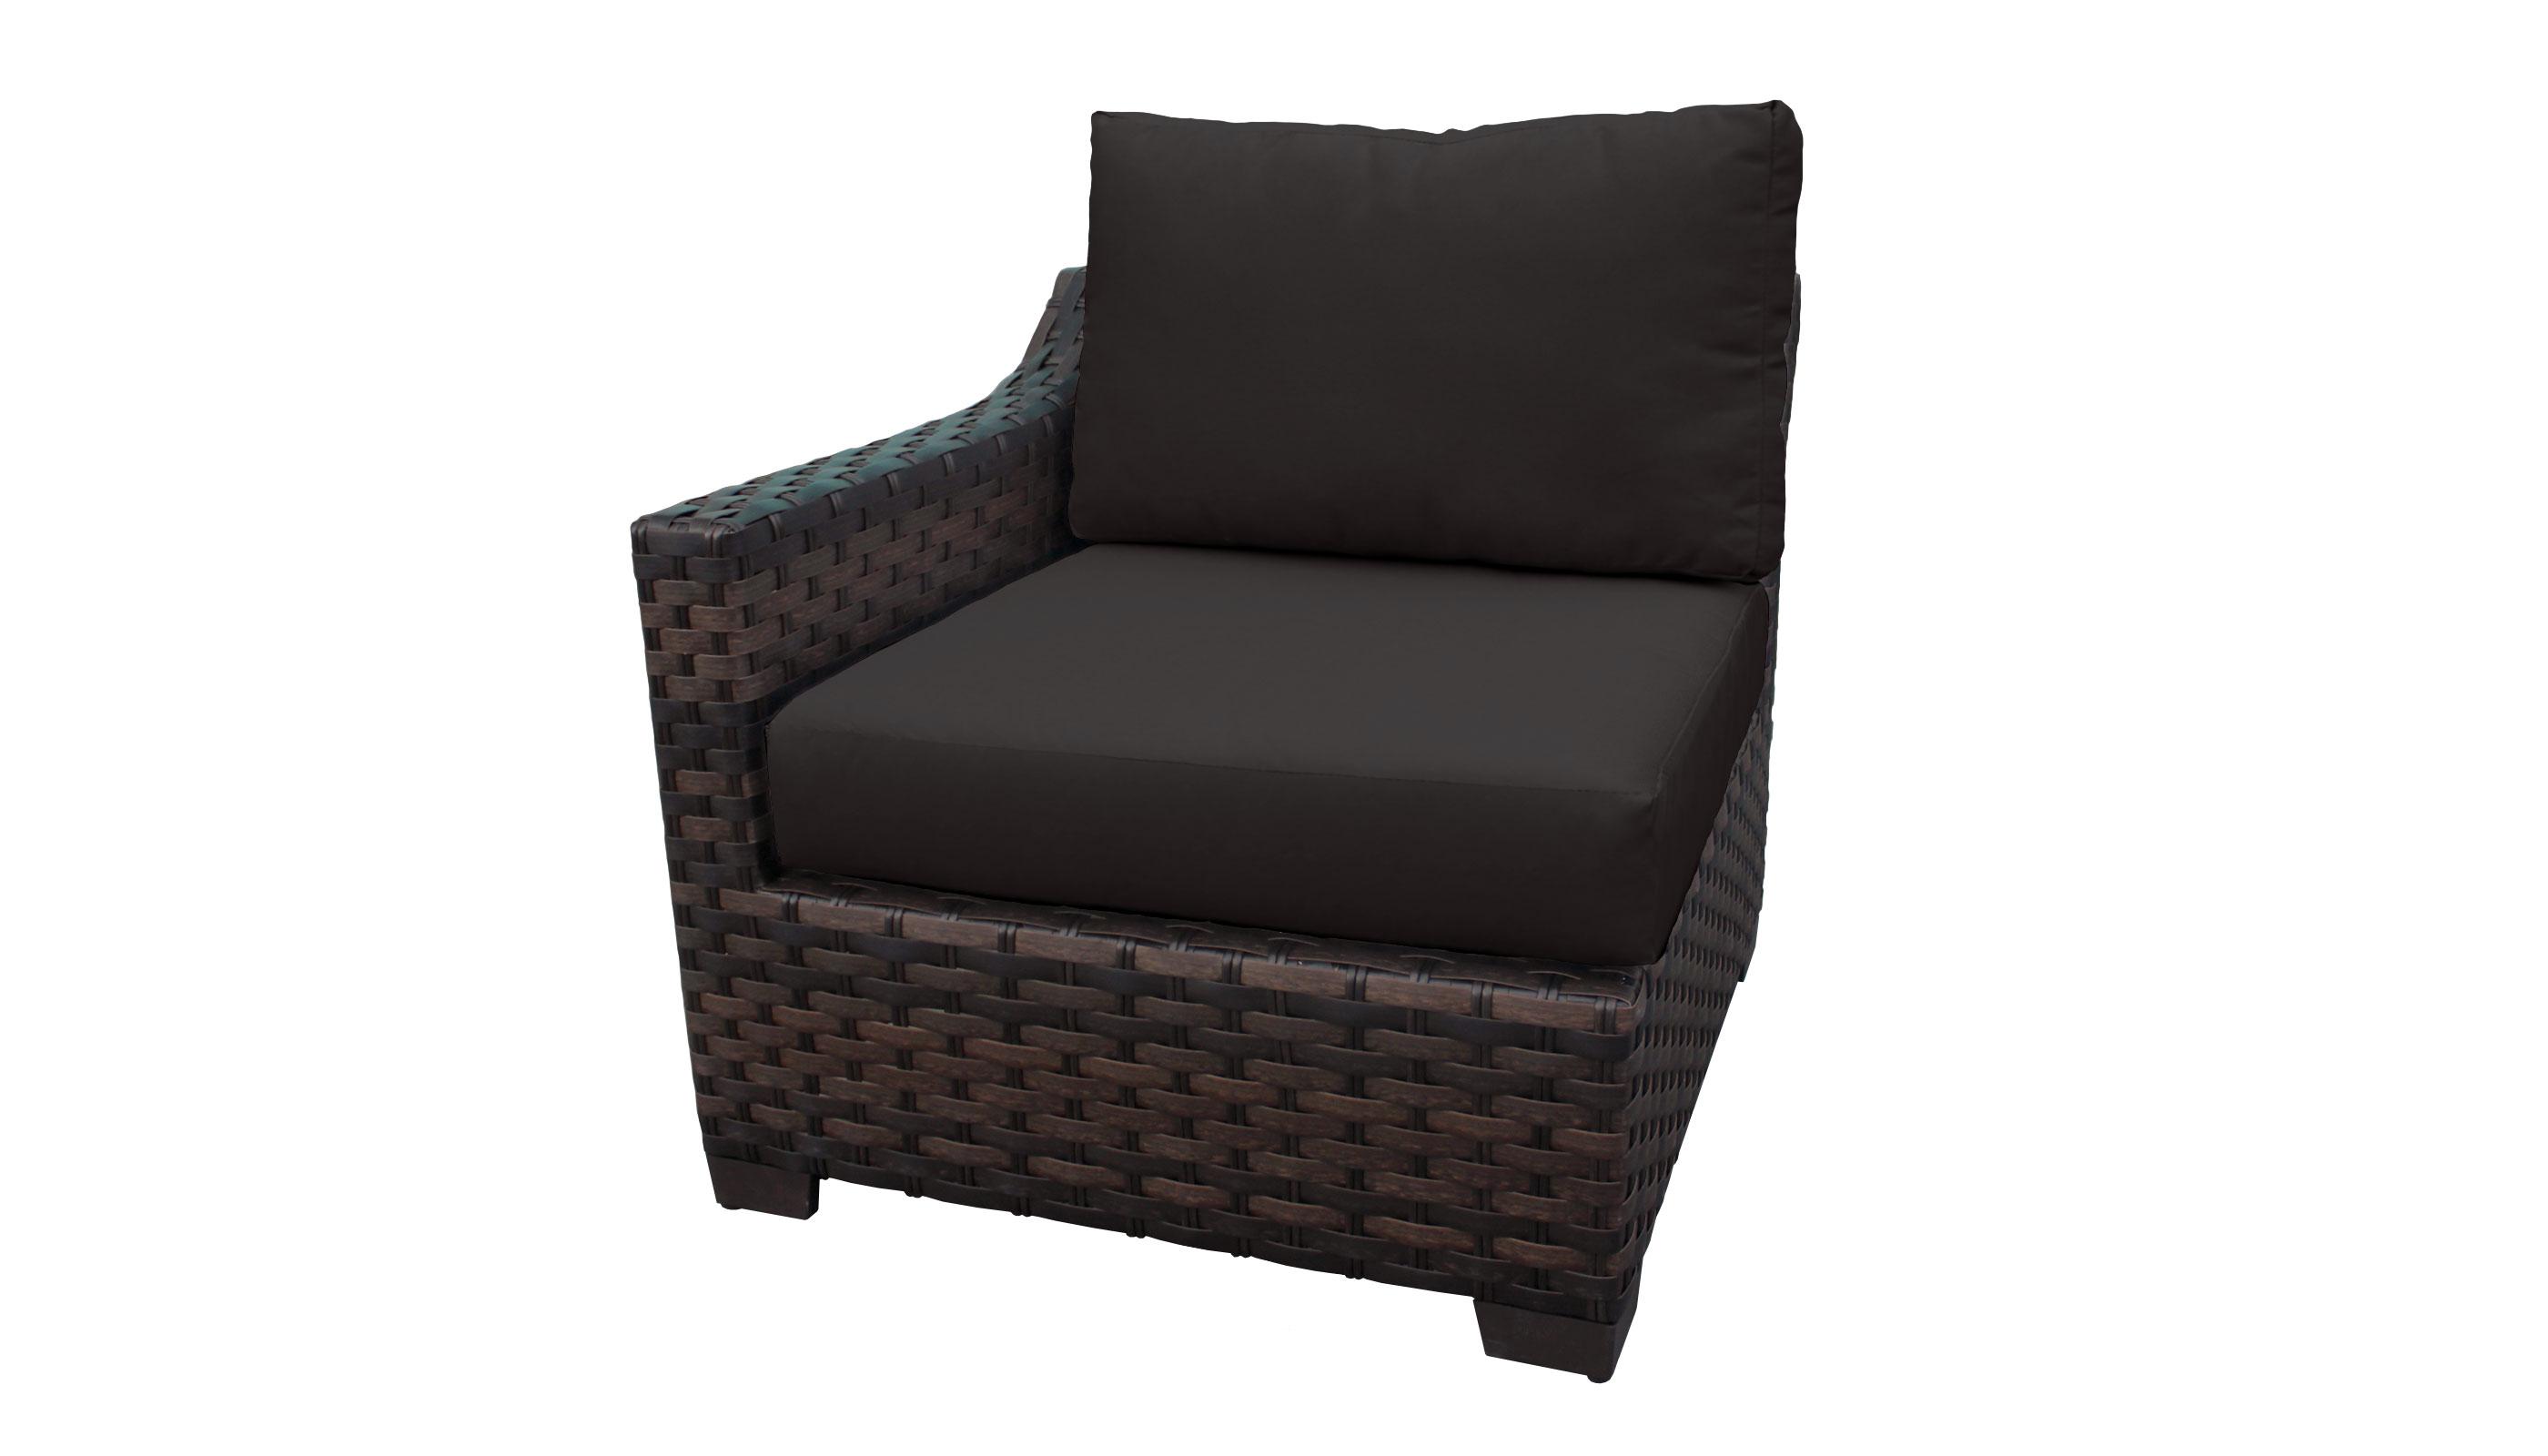 River Brook 3 Piece Outdoor Wicker Patio Furniture Set 03c - TK Classics